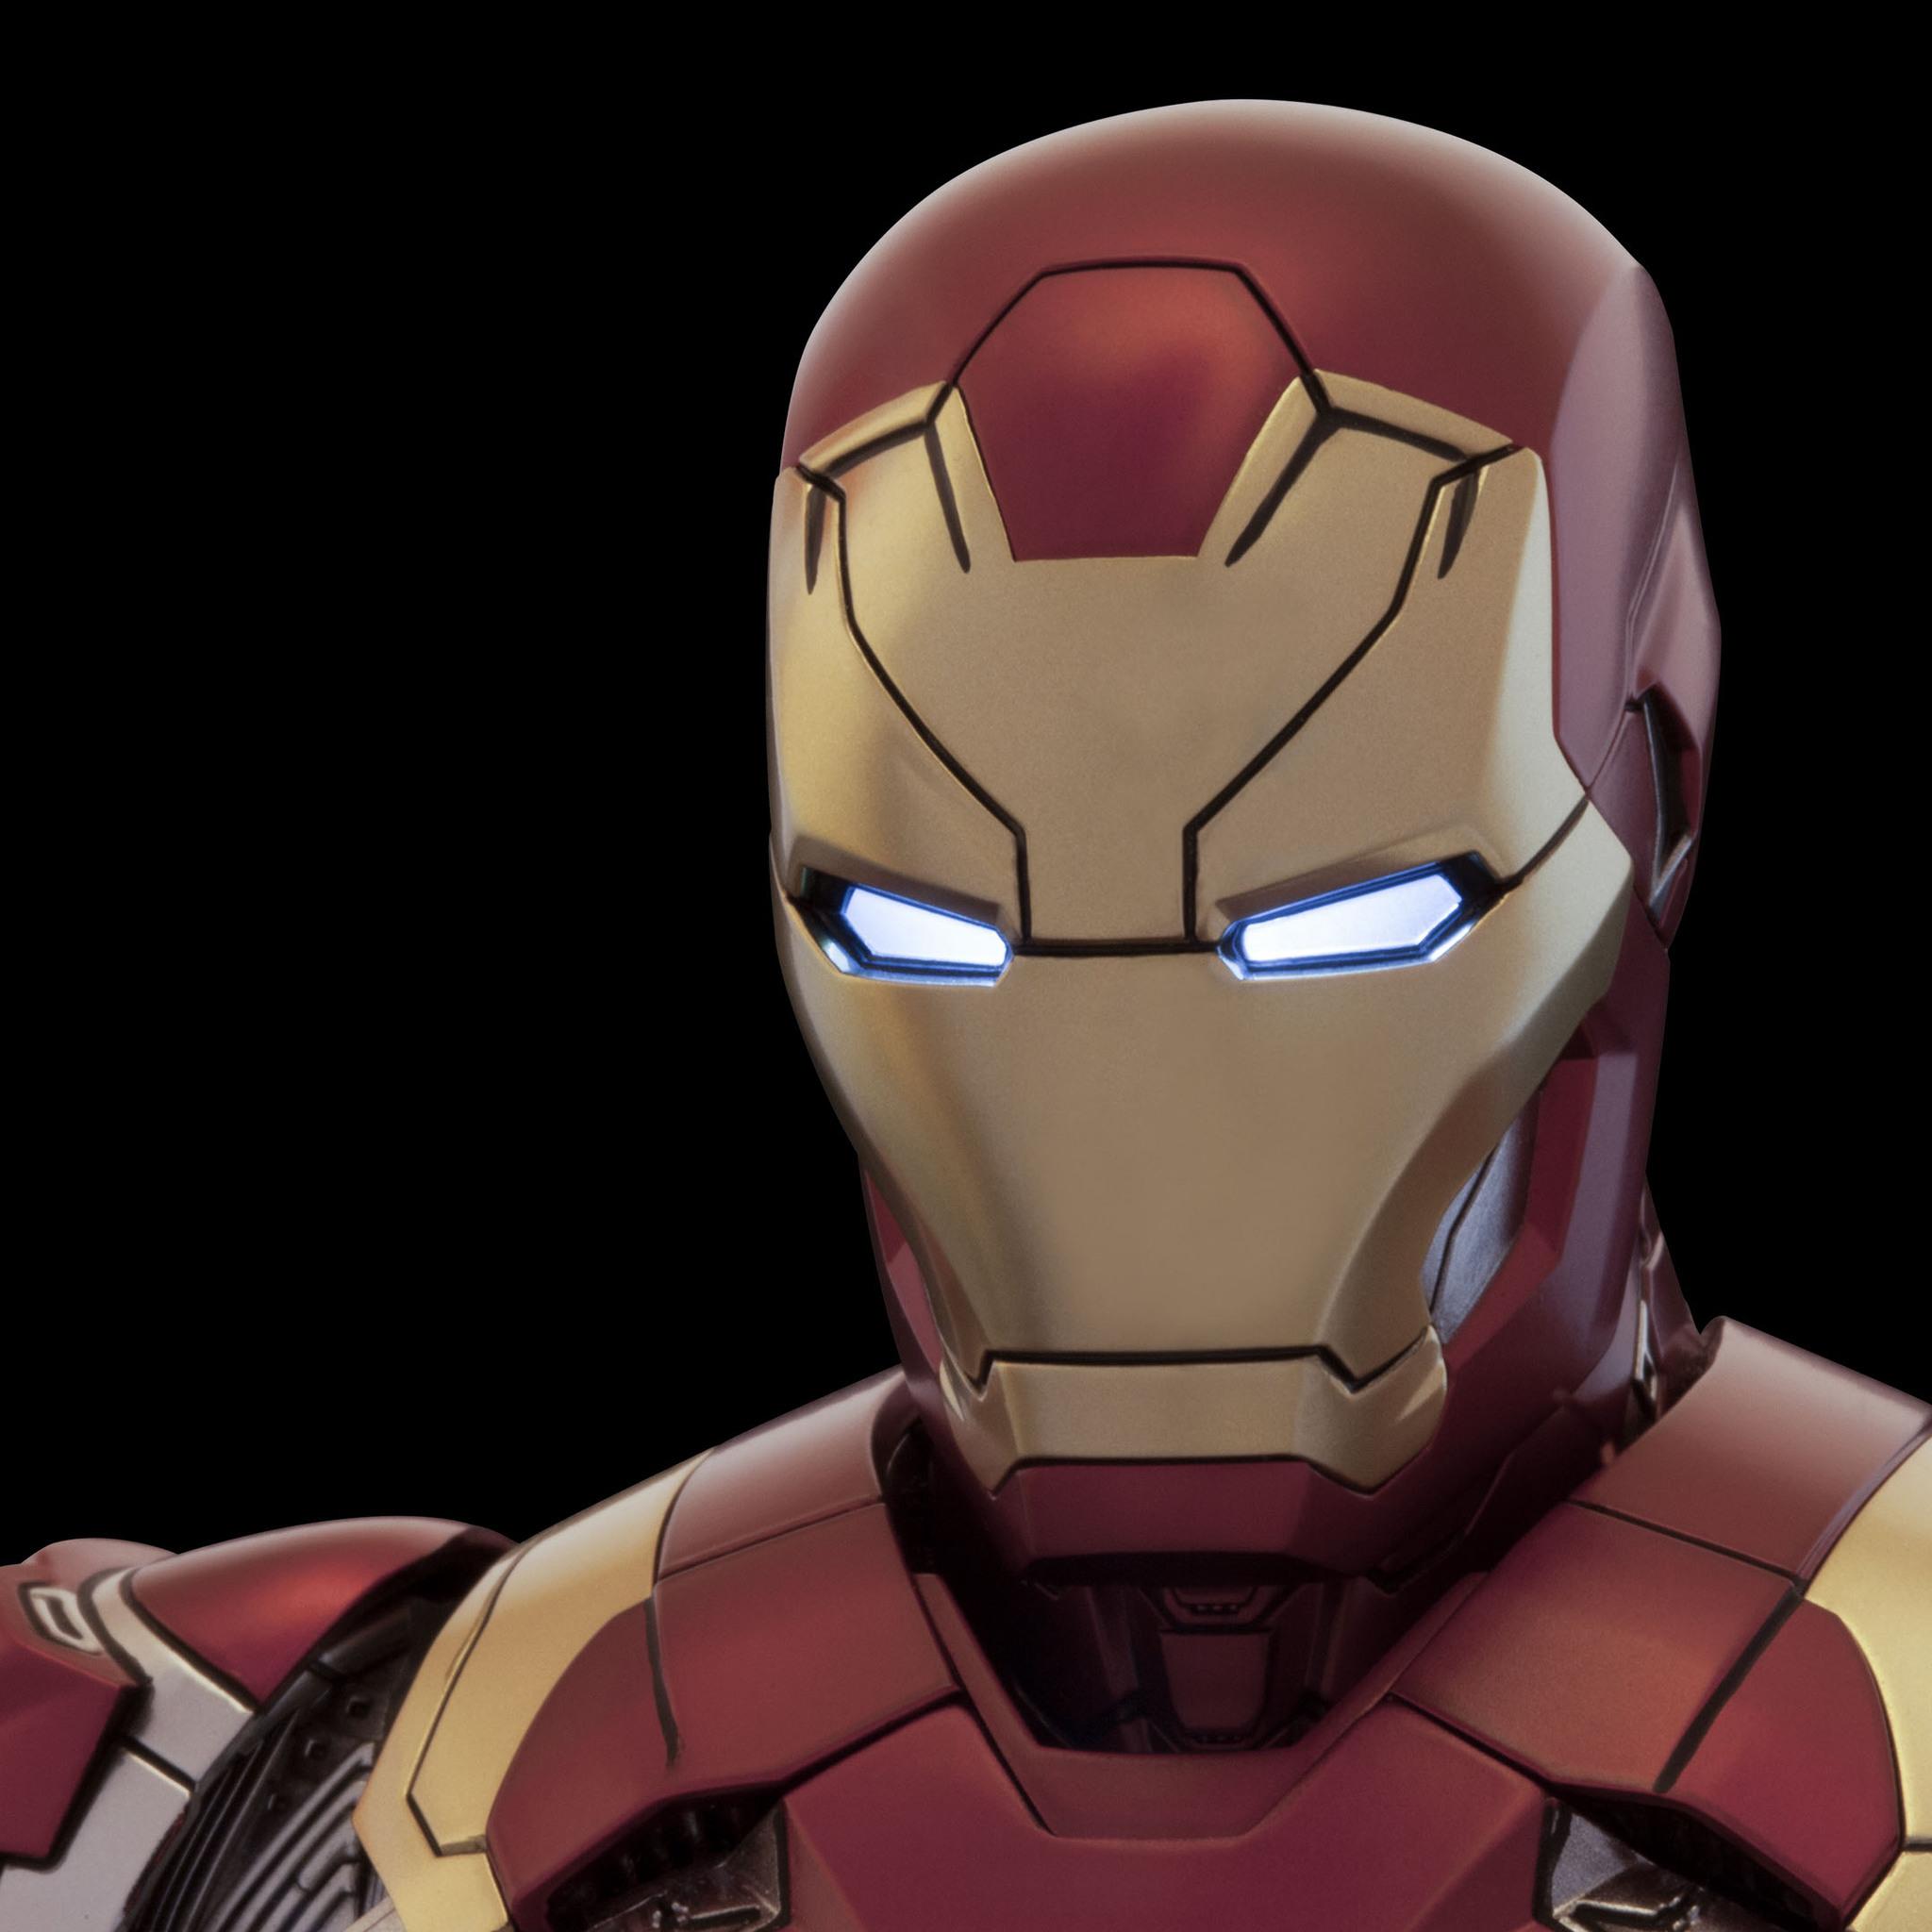 2048x2048 Iron Man Mark Vi 4k Ipad Air Hd 4k Wallpapers